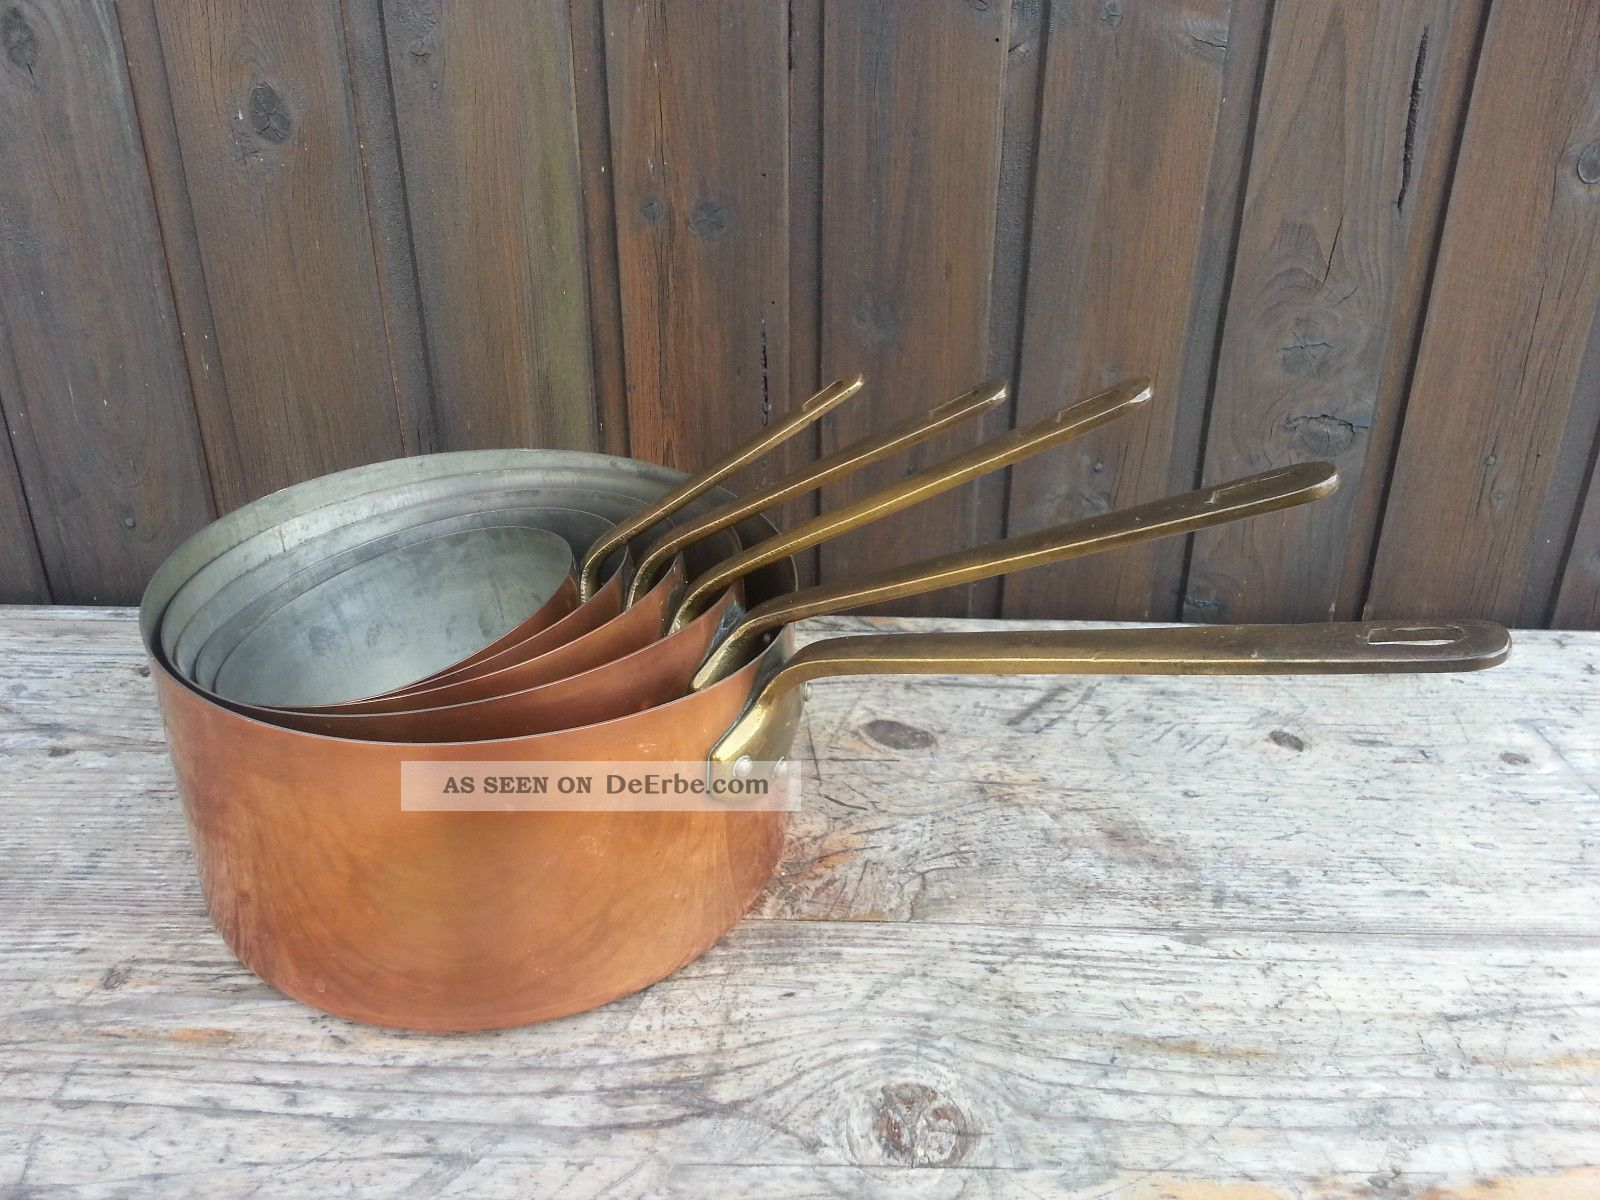 5 Alte Kupfertöpfe / Kasserollen / Metaux Ouvres Vesoul Art De Cuisine - France Haushalt Bild